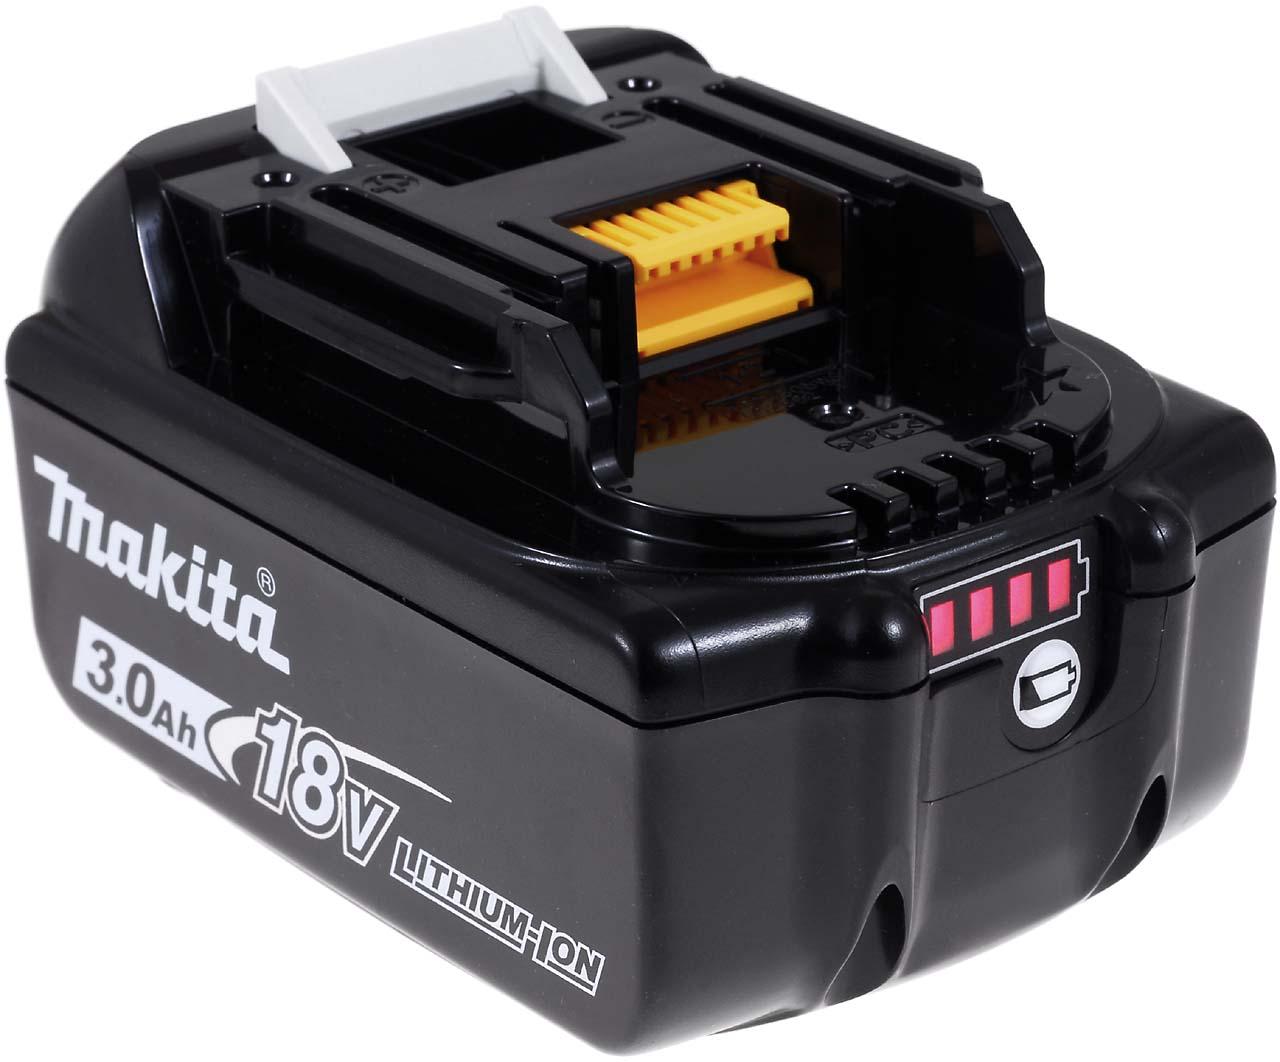 Akku zu Werkzeug Makita Blockakku BDF451 3000mAh mit LED Original